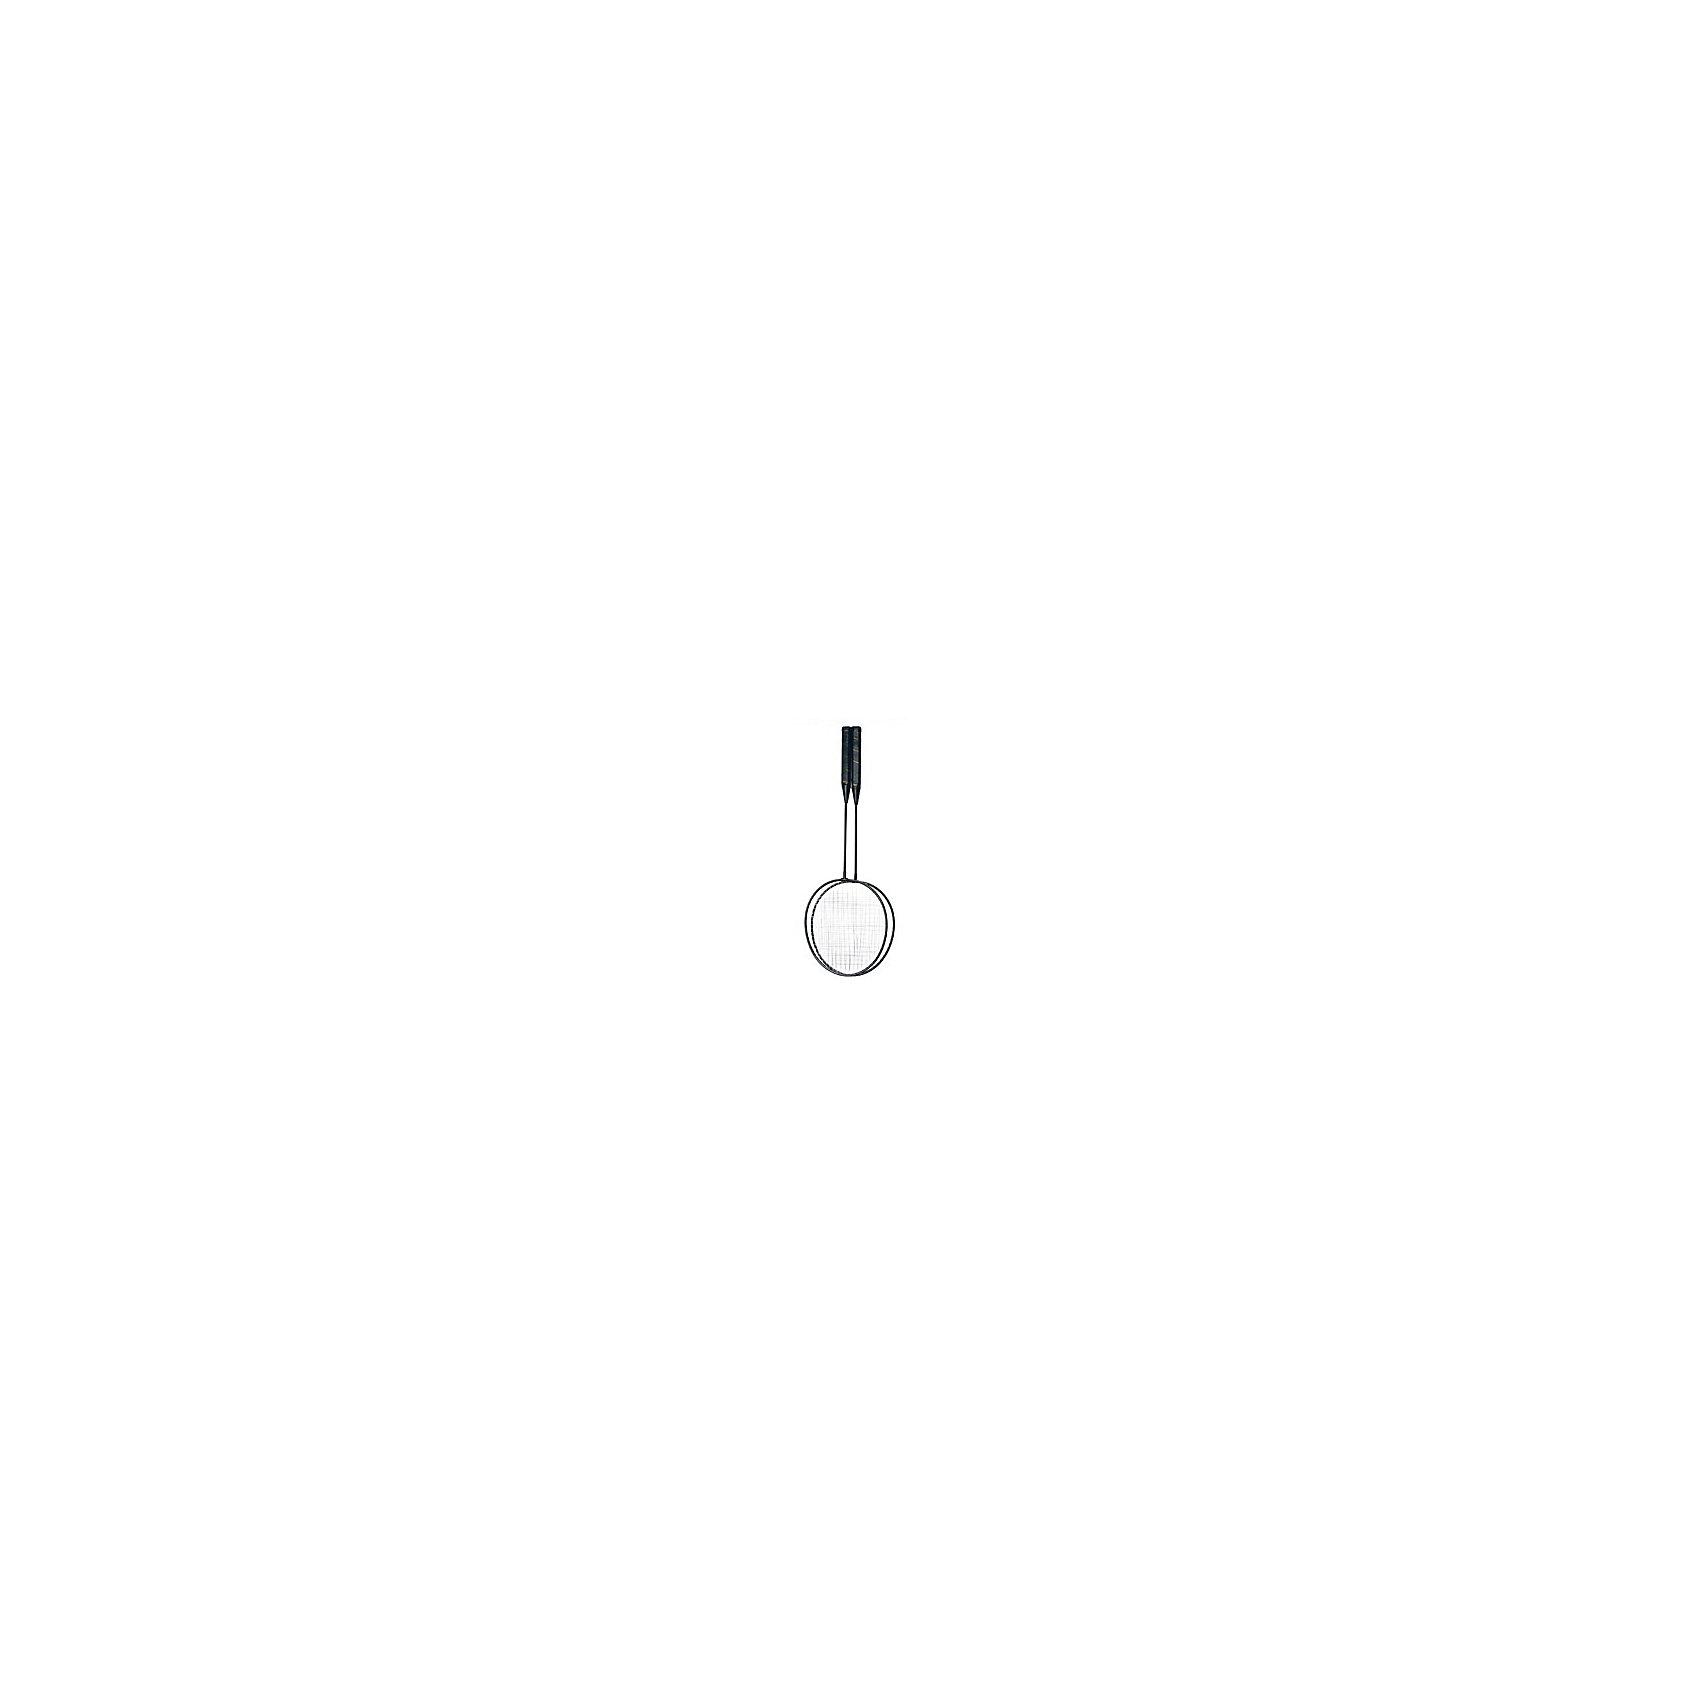 InSummer Набор для игры в бадминтон, InSummer insummer конус красный insummer